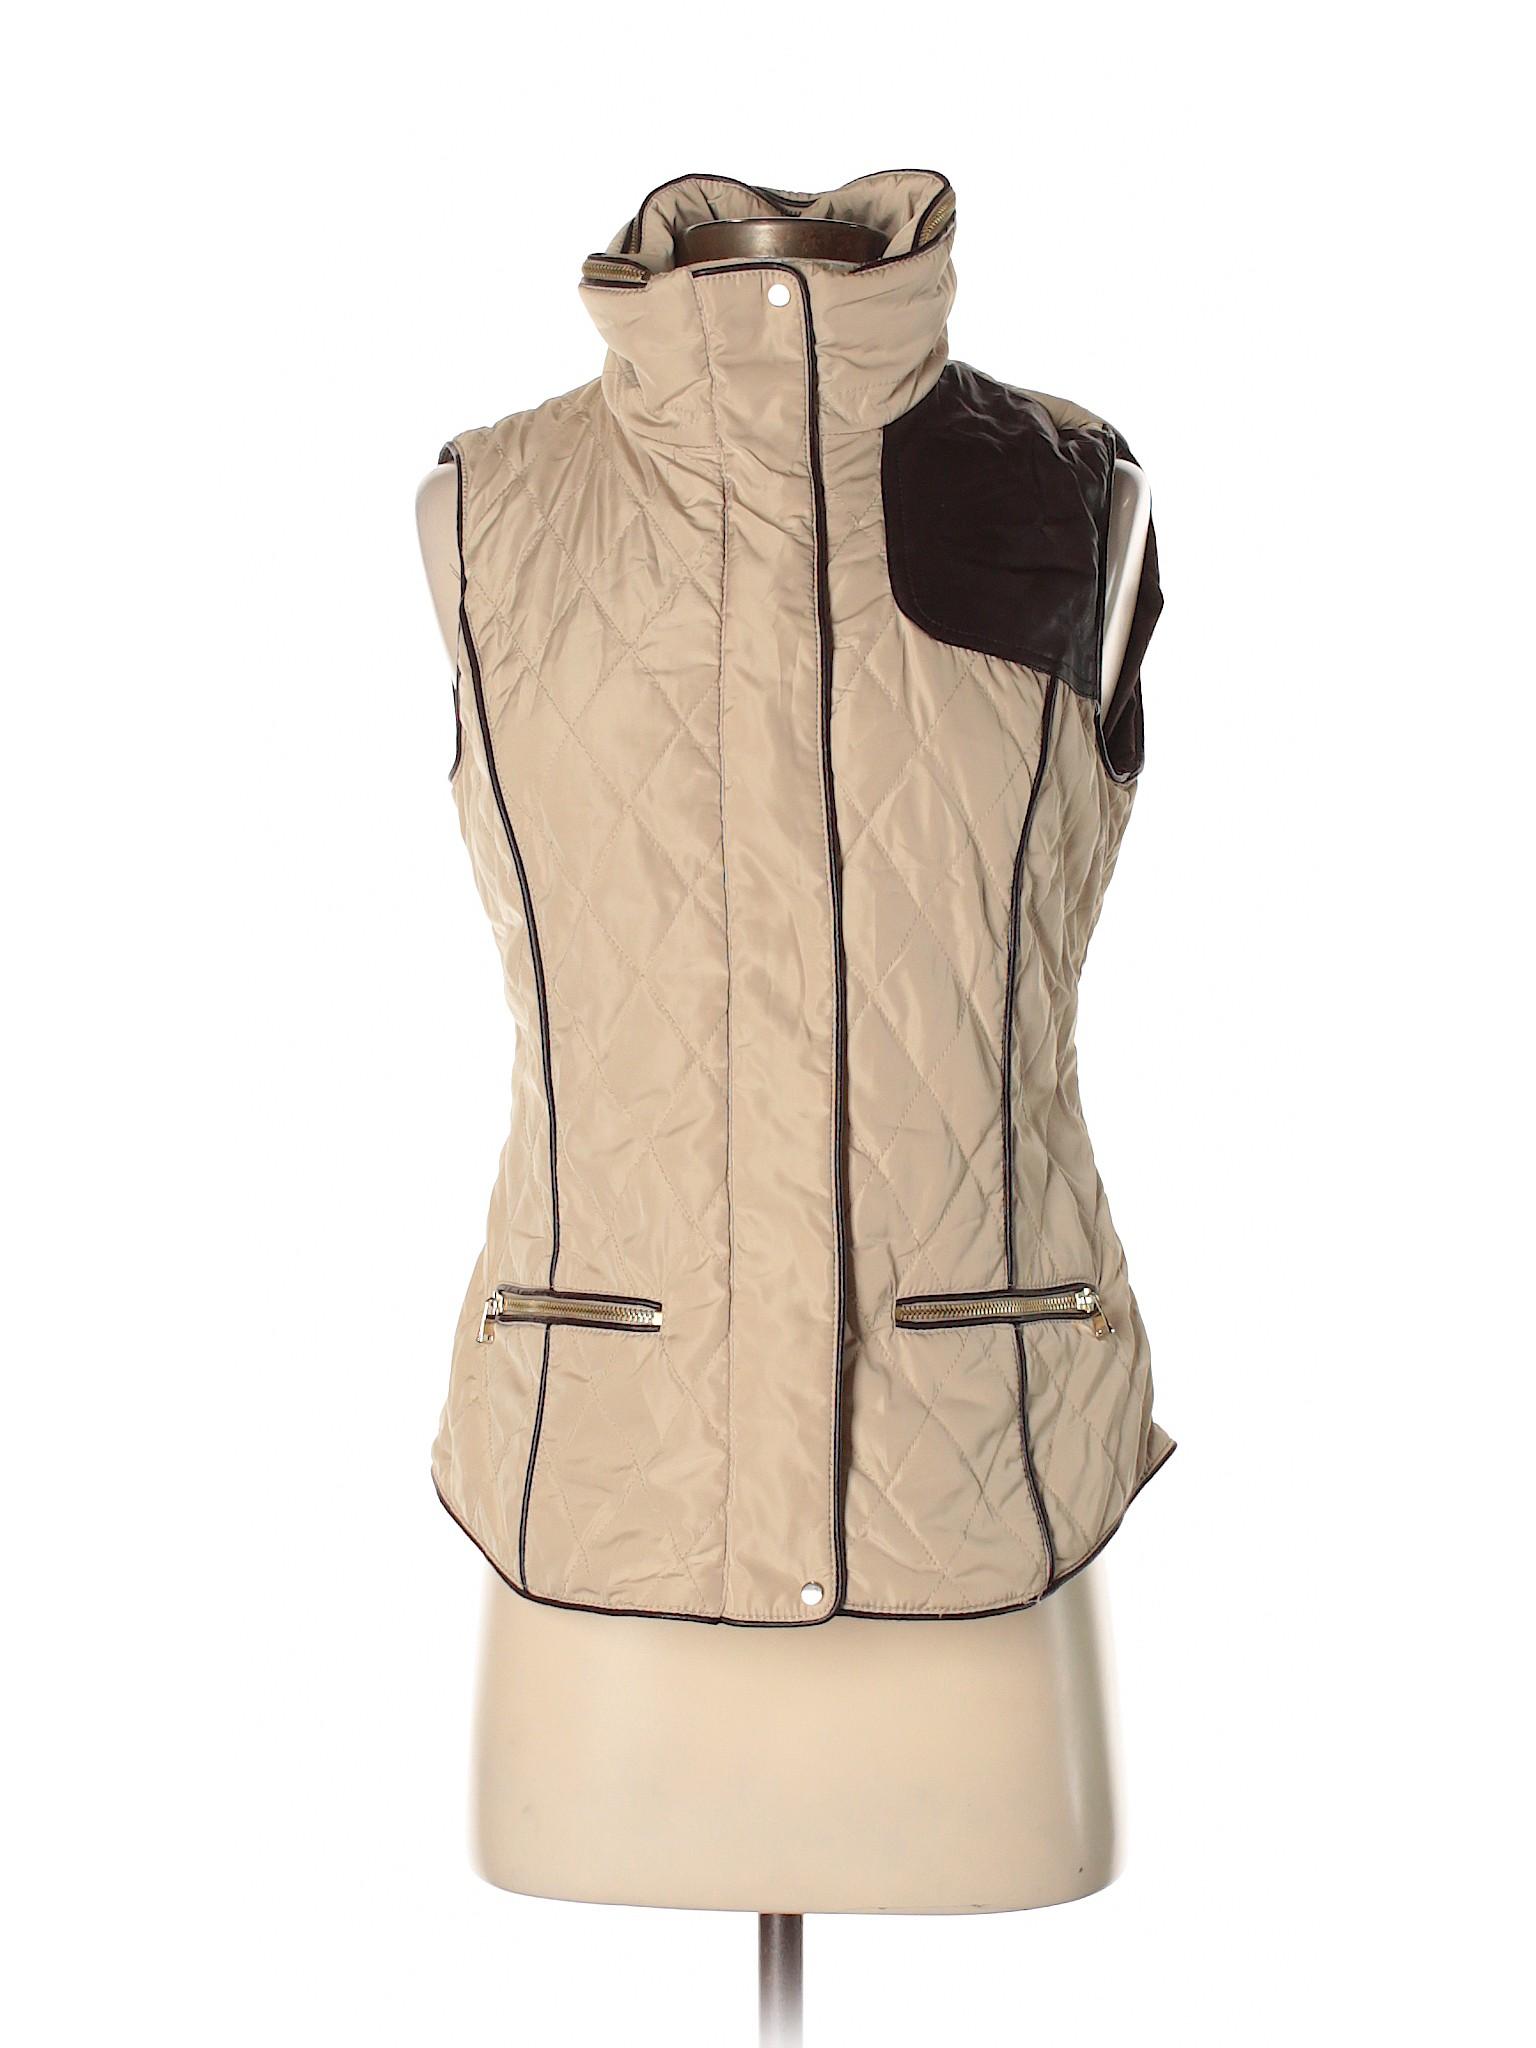 Leisure Leisure winter Zara Vest winter Basic H1ng4qwz